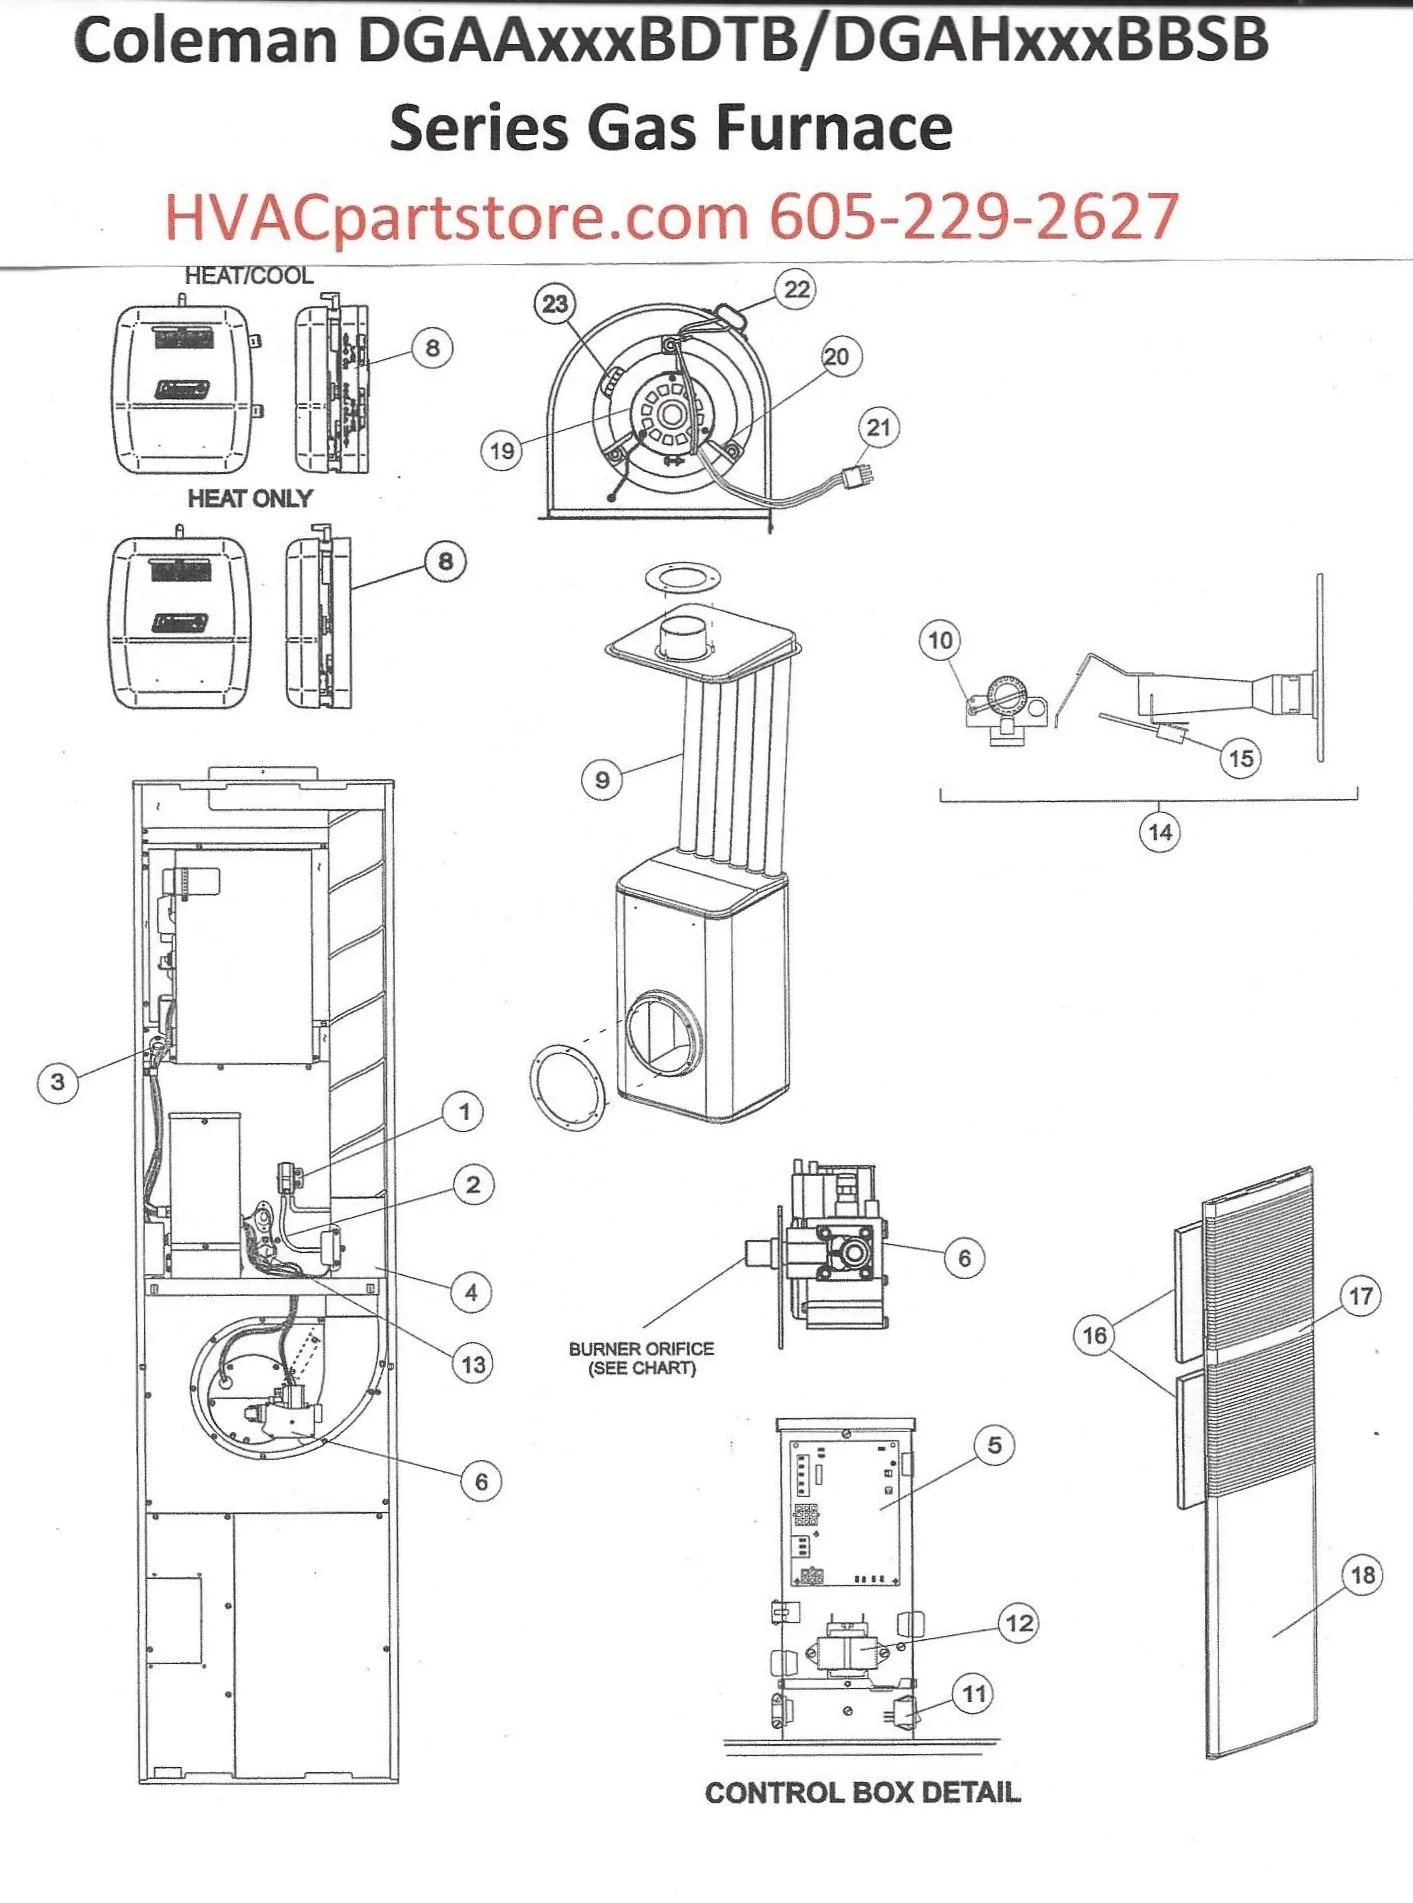 DGAAxxxBDTBDiagram thermopile gas valve wiring diagram turcolea com thermopile gas valve wiring diagram at soozxer.org